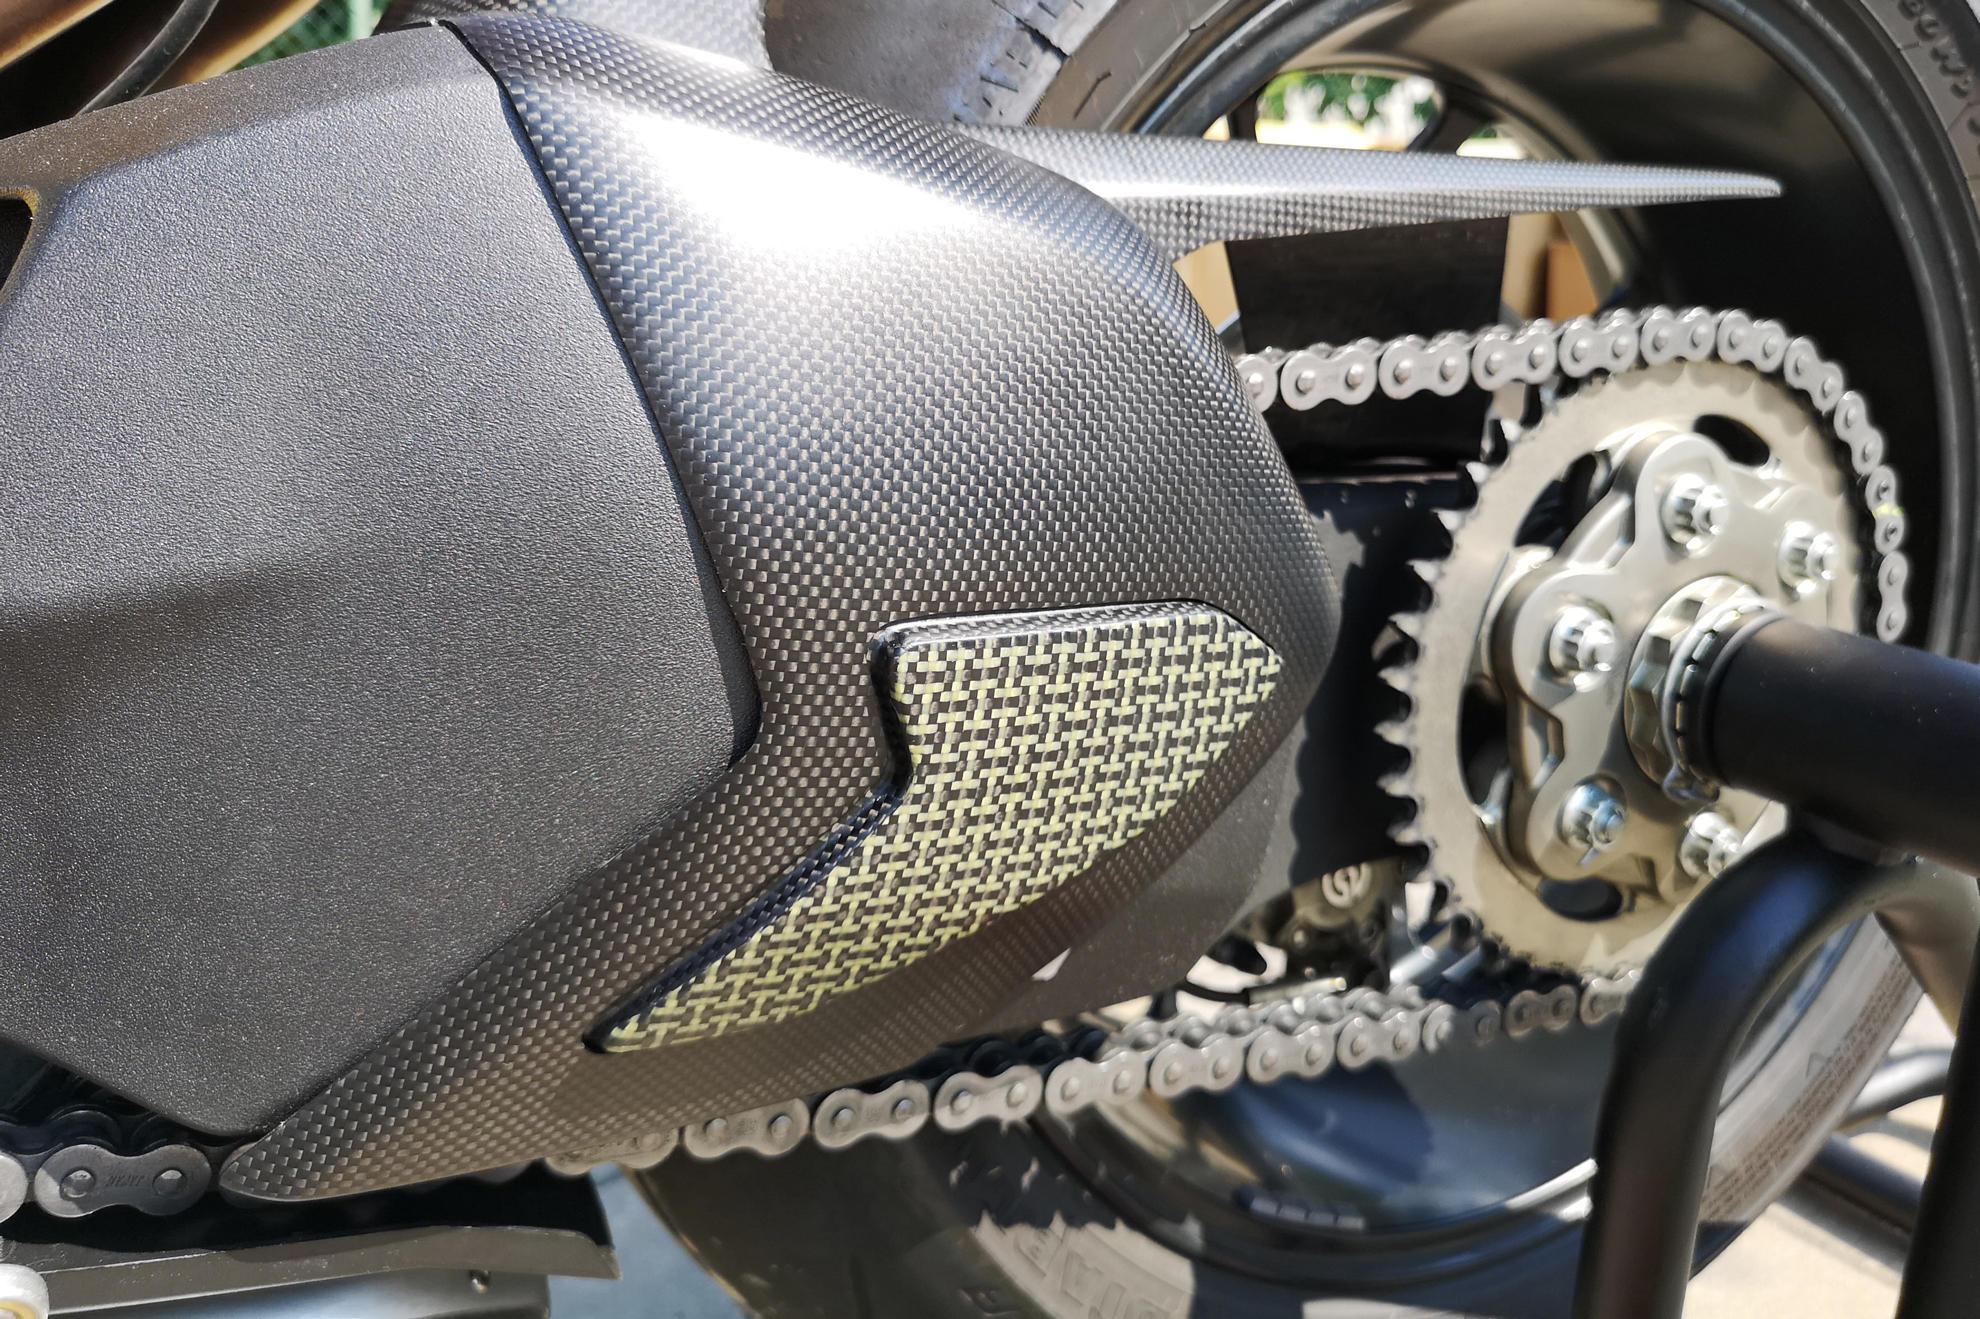 Swingarm Cover Ducati Panigale V4 Carbon Kevlar Cnc Racing